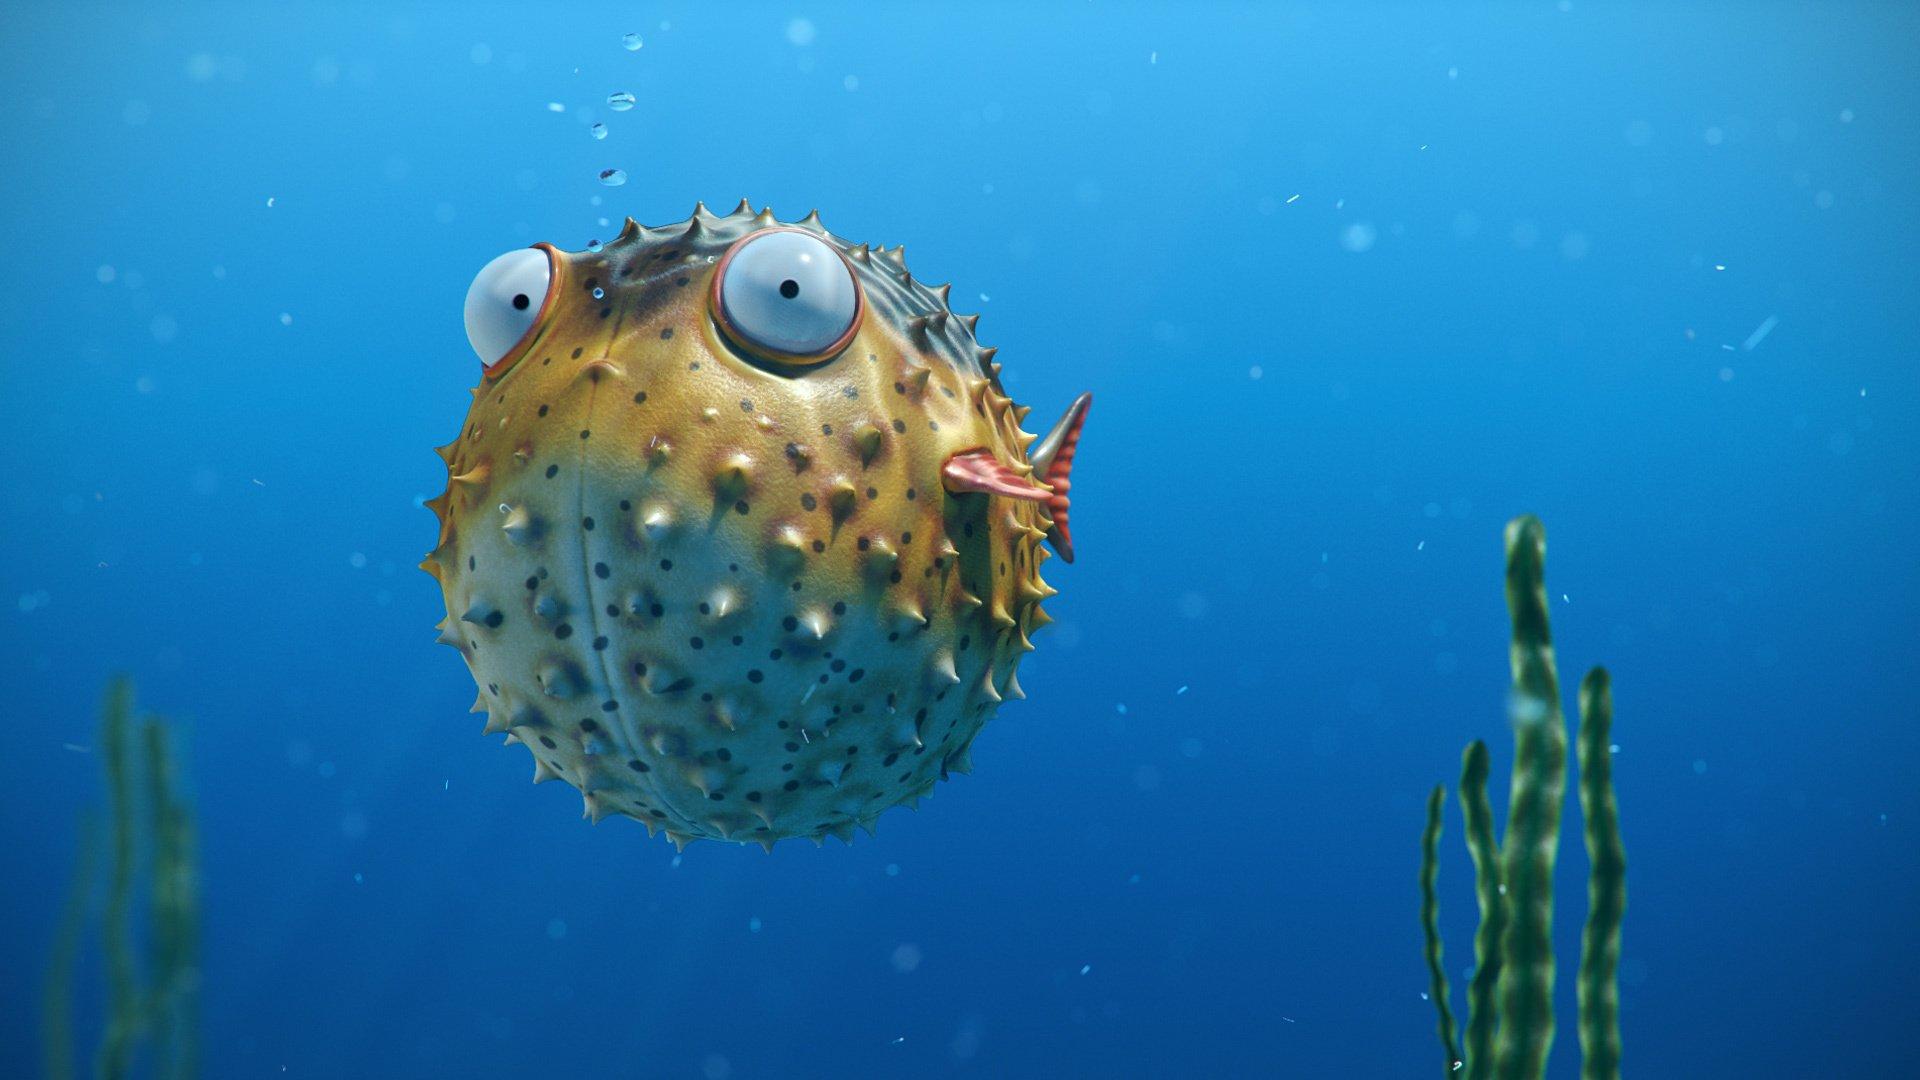 Sea bubbles spikes eye ball fish ocean underwater for Disegno pesce palla